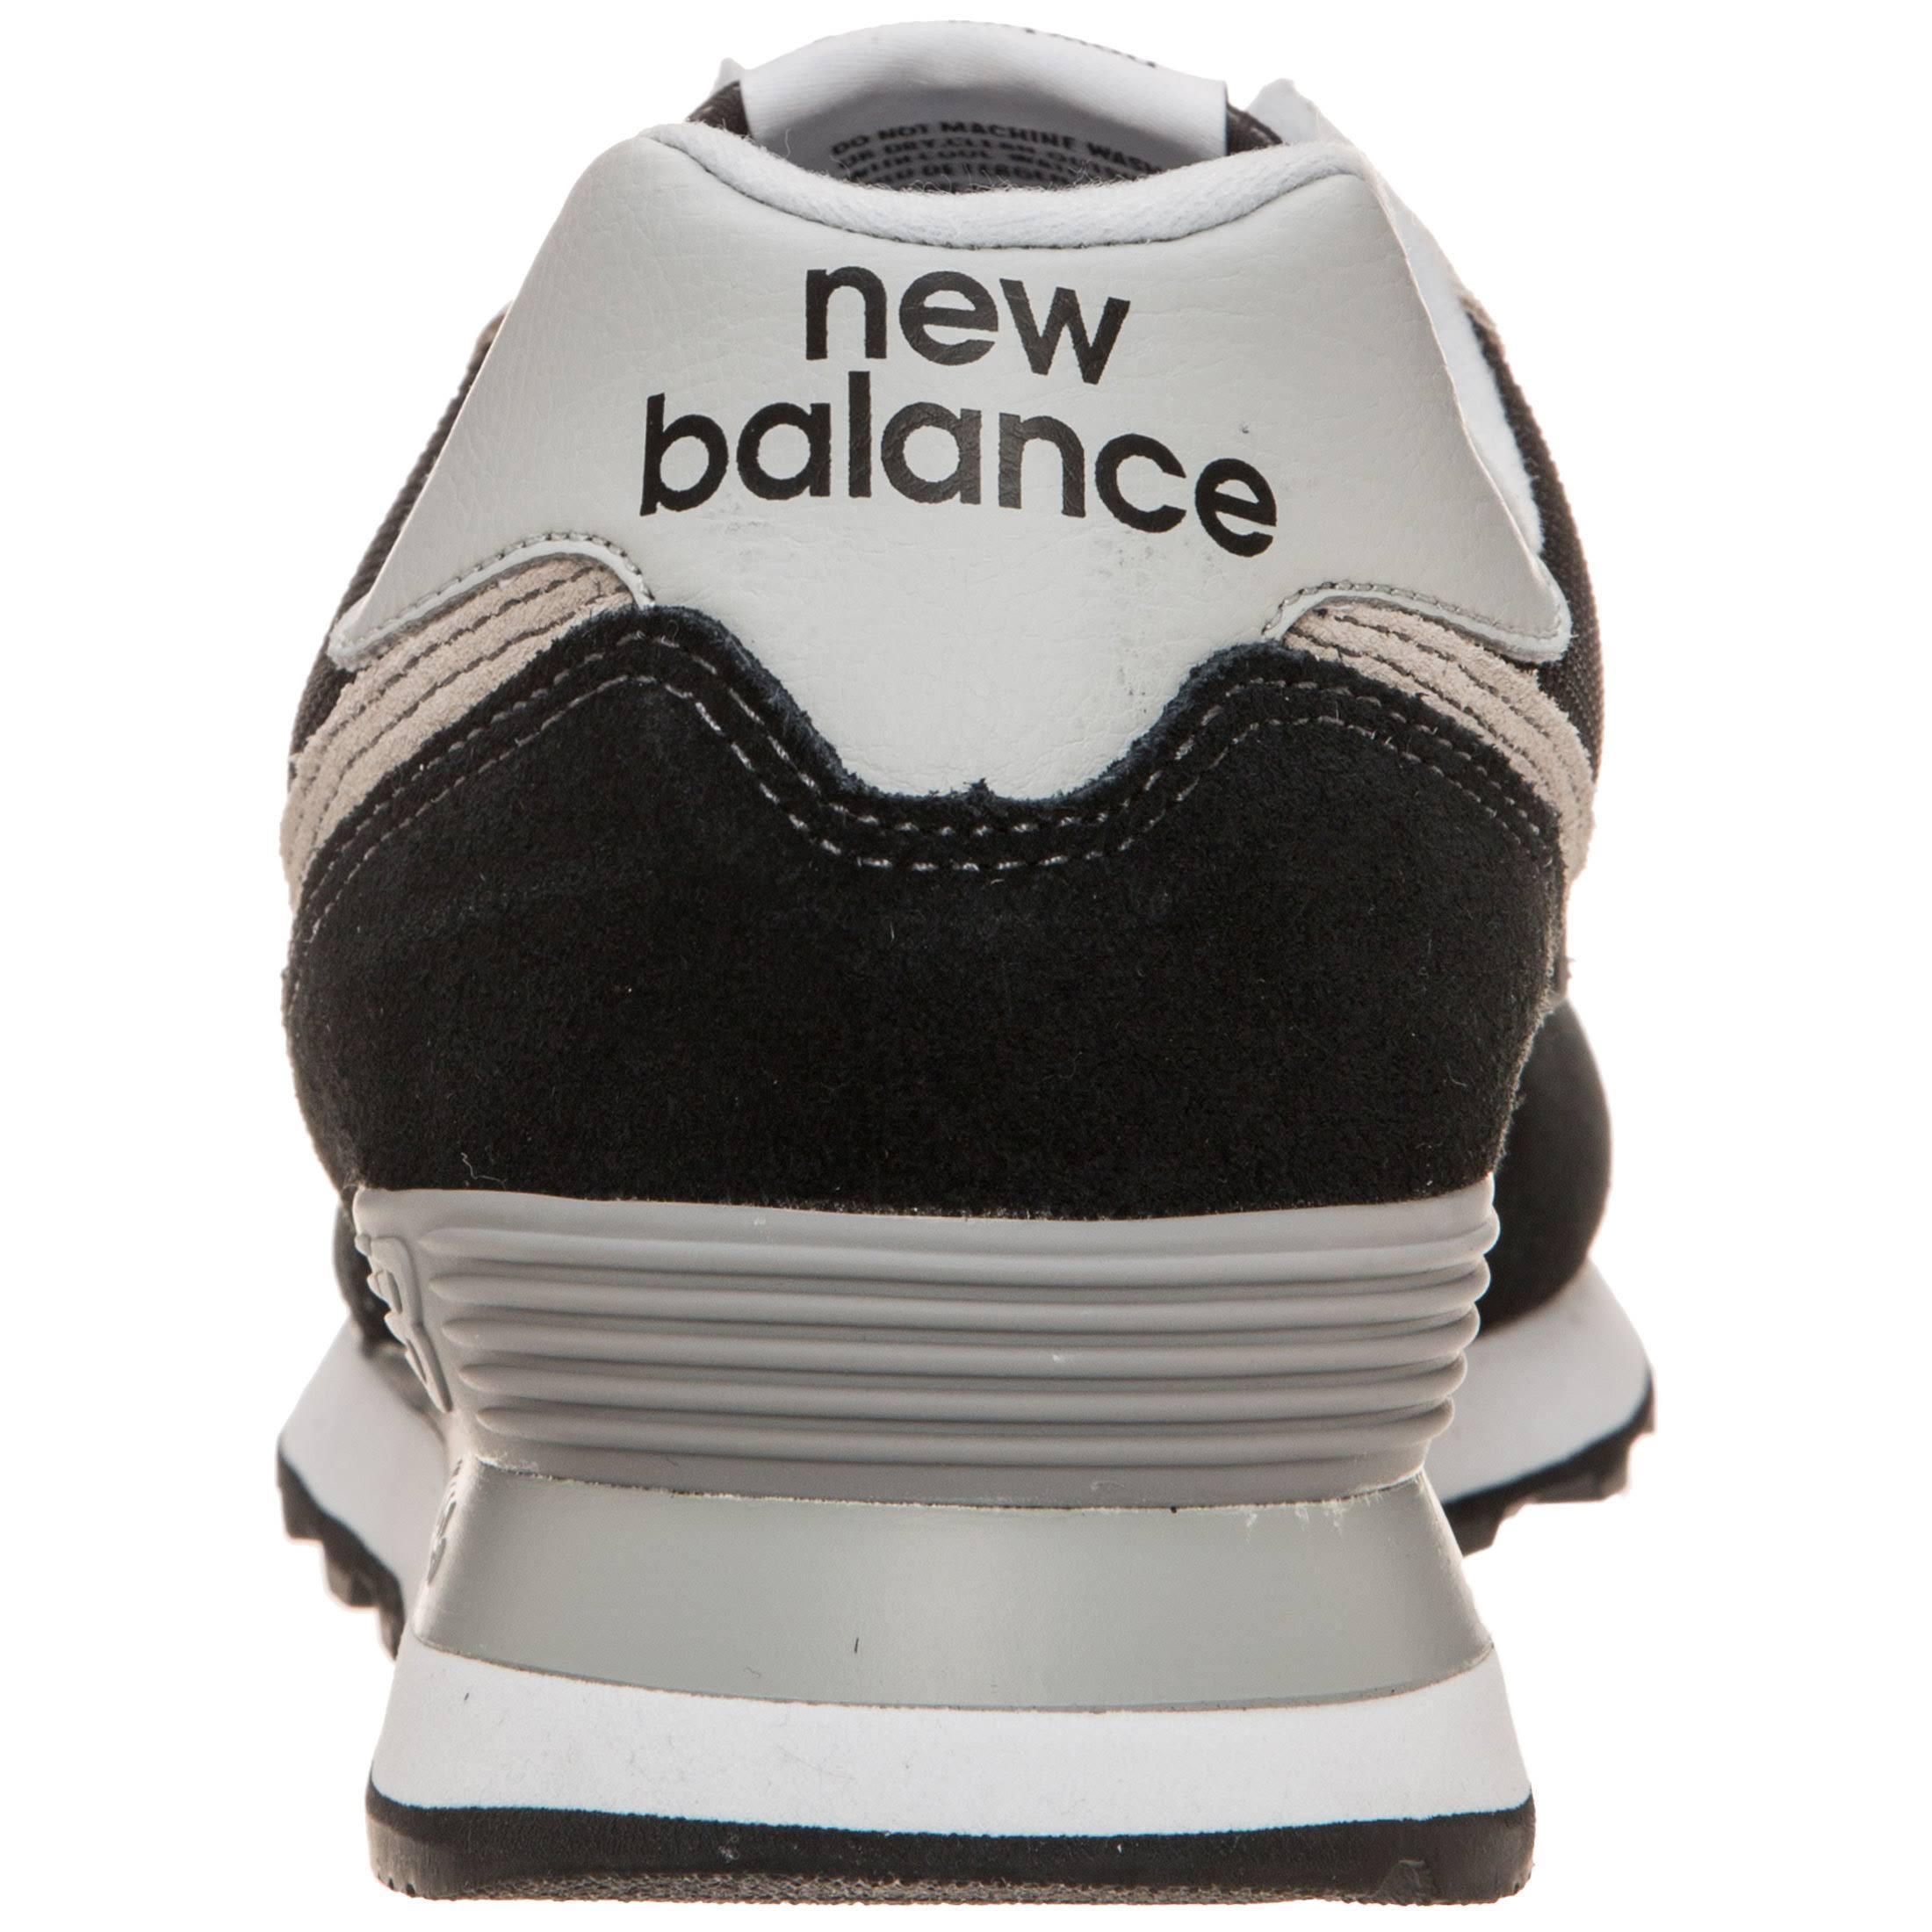 Egk Herren Schwarz Ml grau Schwarz Balance New 45 574 Black Schuhe 8q0St4x